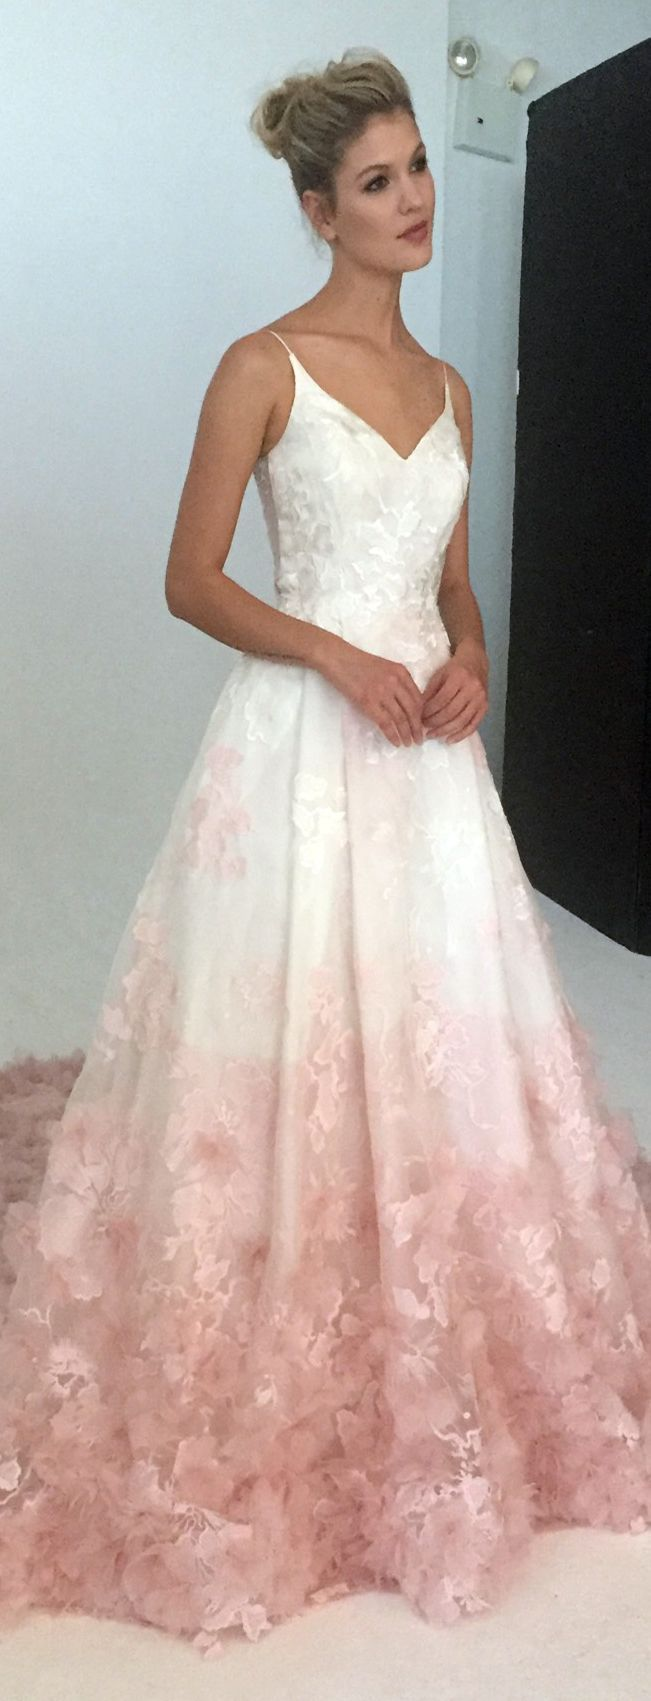 15 schöne rosa Brautkleider | Blush wedding dresses, Blush weddings ...